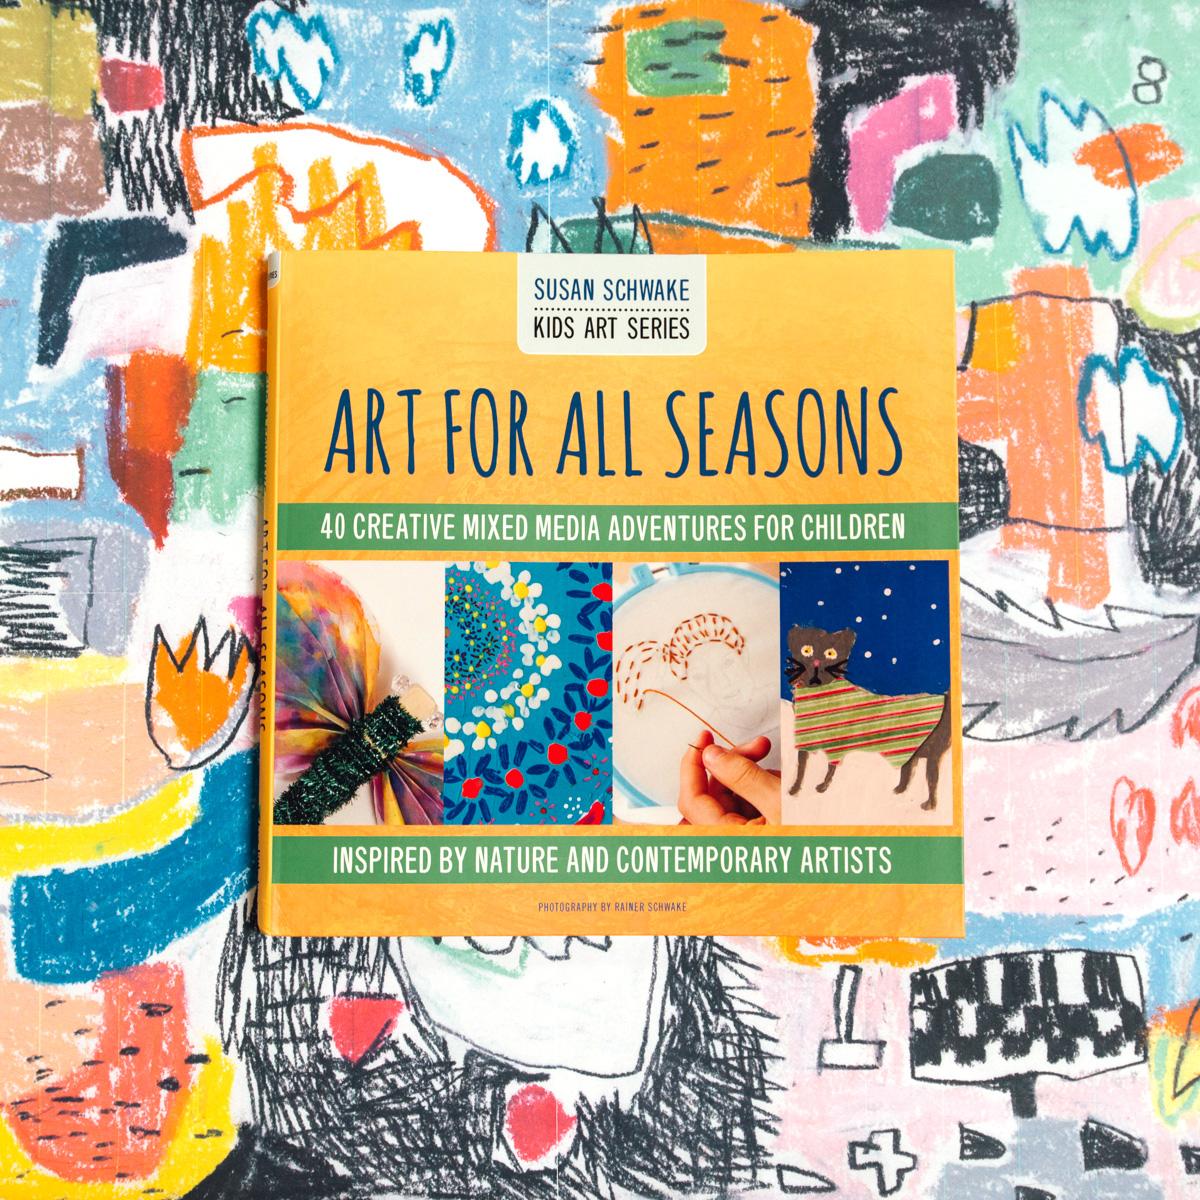 Art For All Seasons  by Susan Schwake.